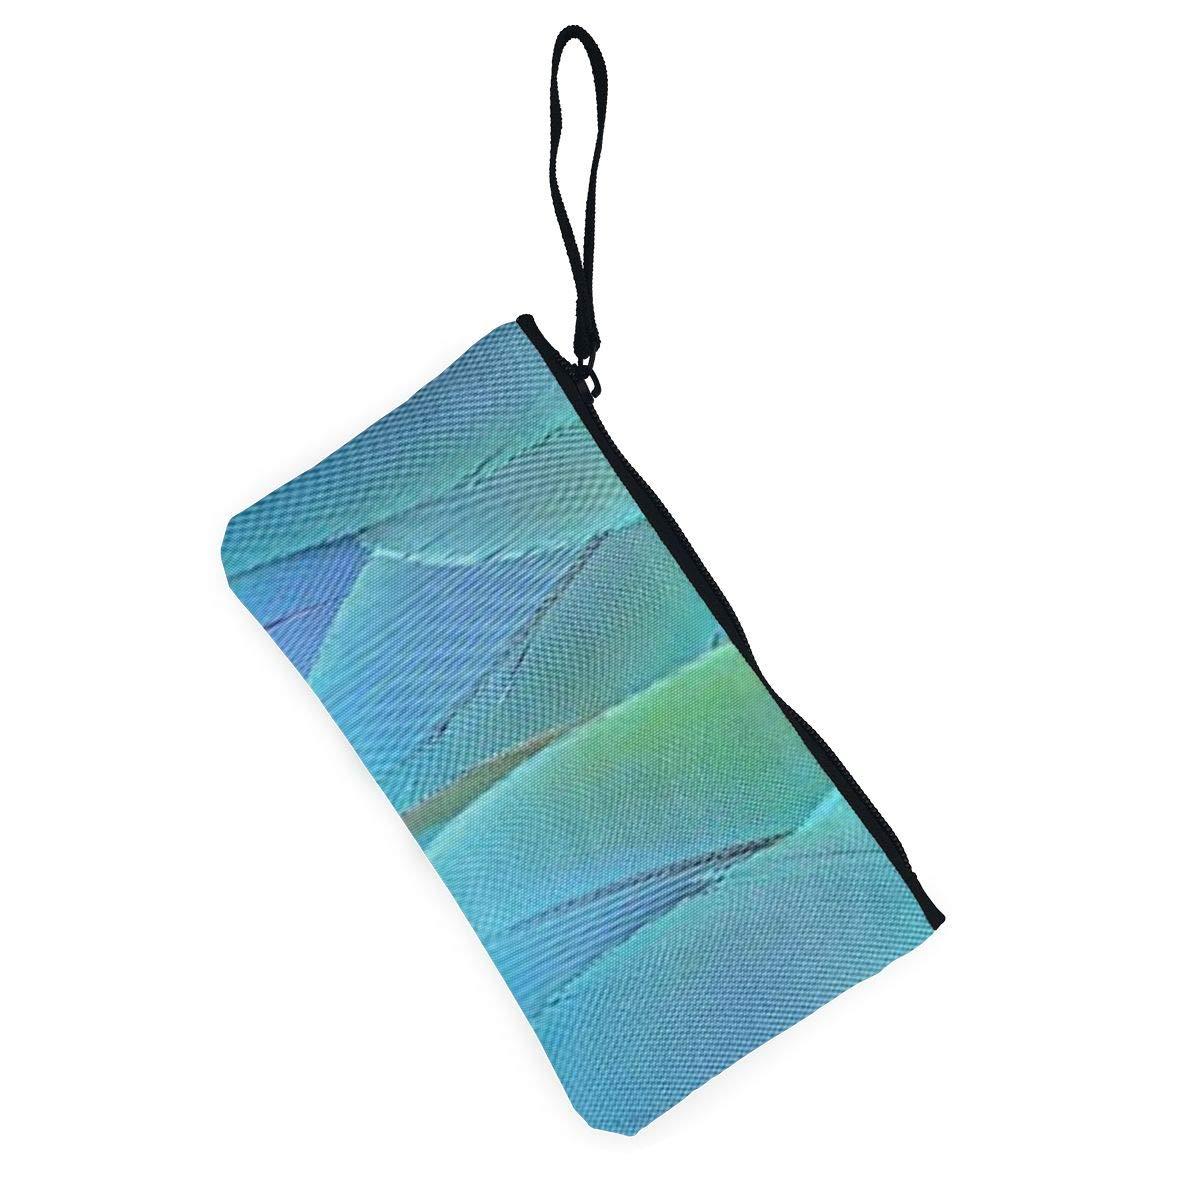 Canvas Cash Coin Purse,Blue Parrot Feather Print Make Up Bag Zipper Small Purse Wallets